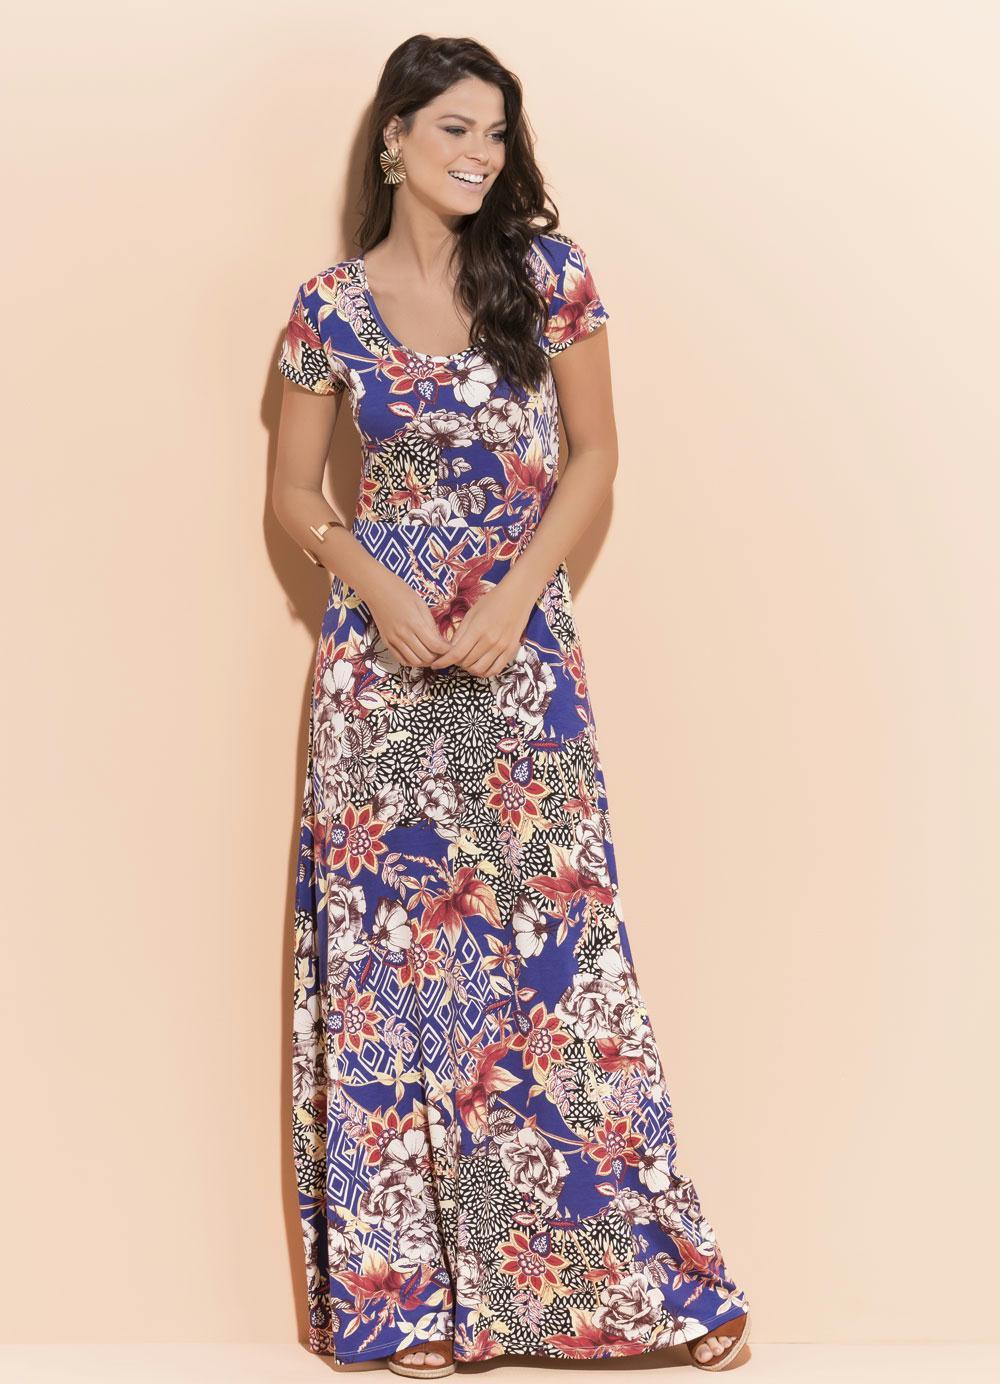 f336c60a1 Vestido Longo Quintess Floral com Manga Curta - Quintess